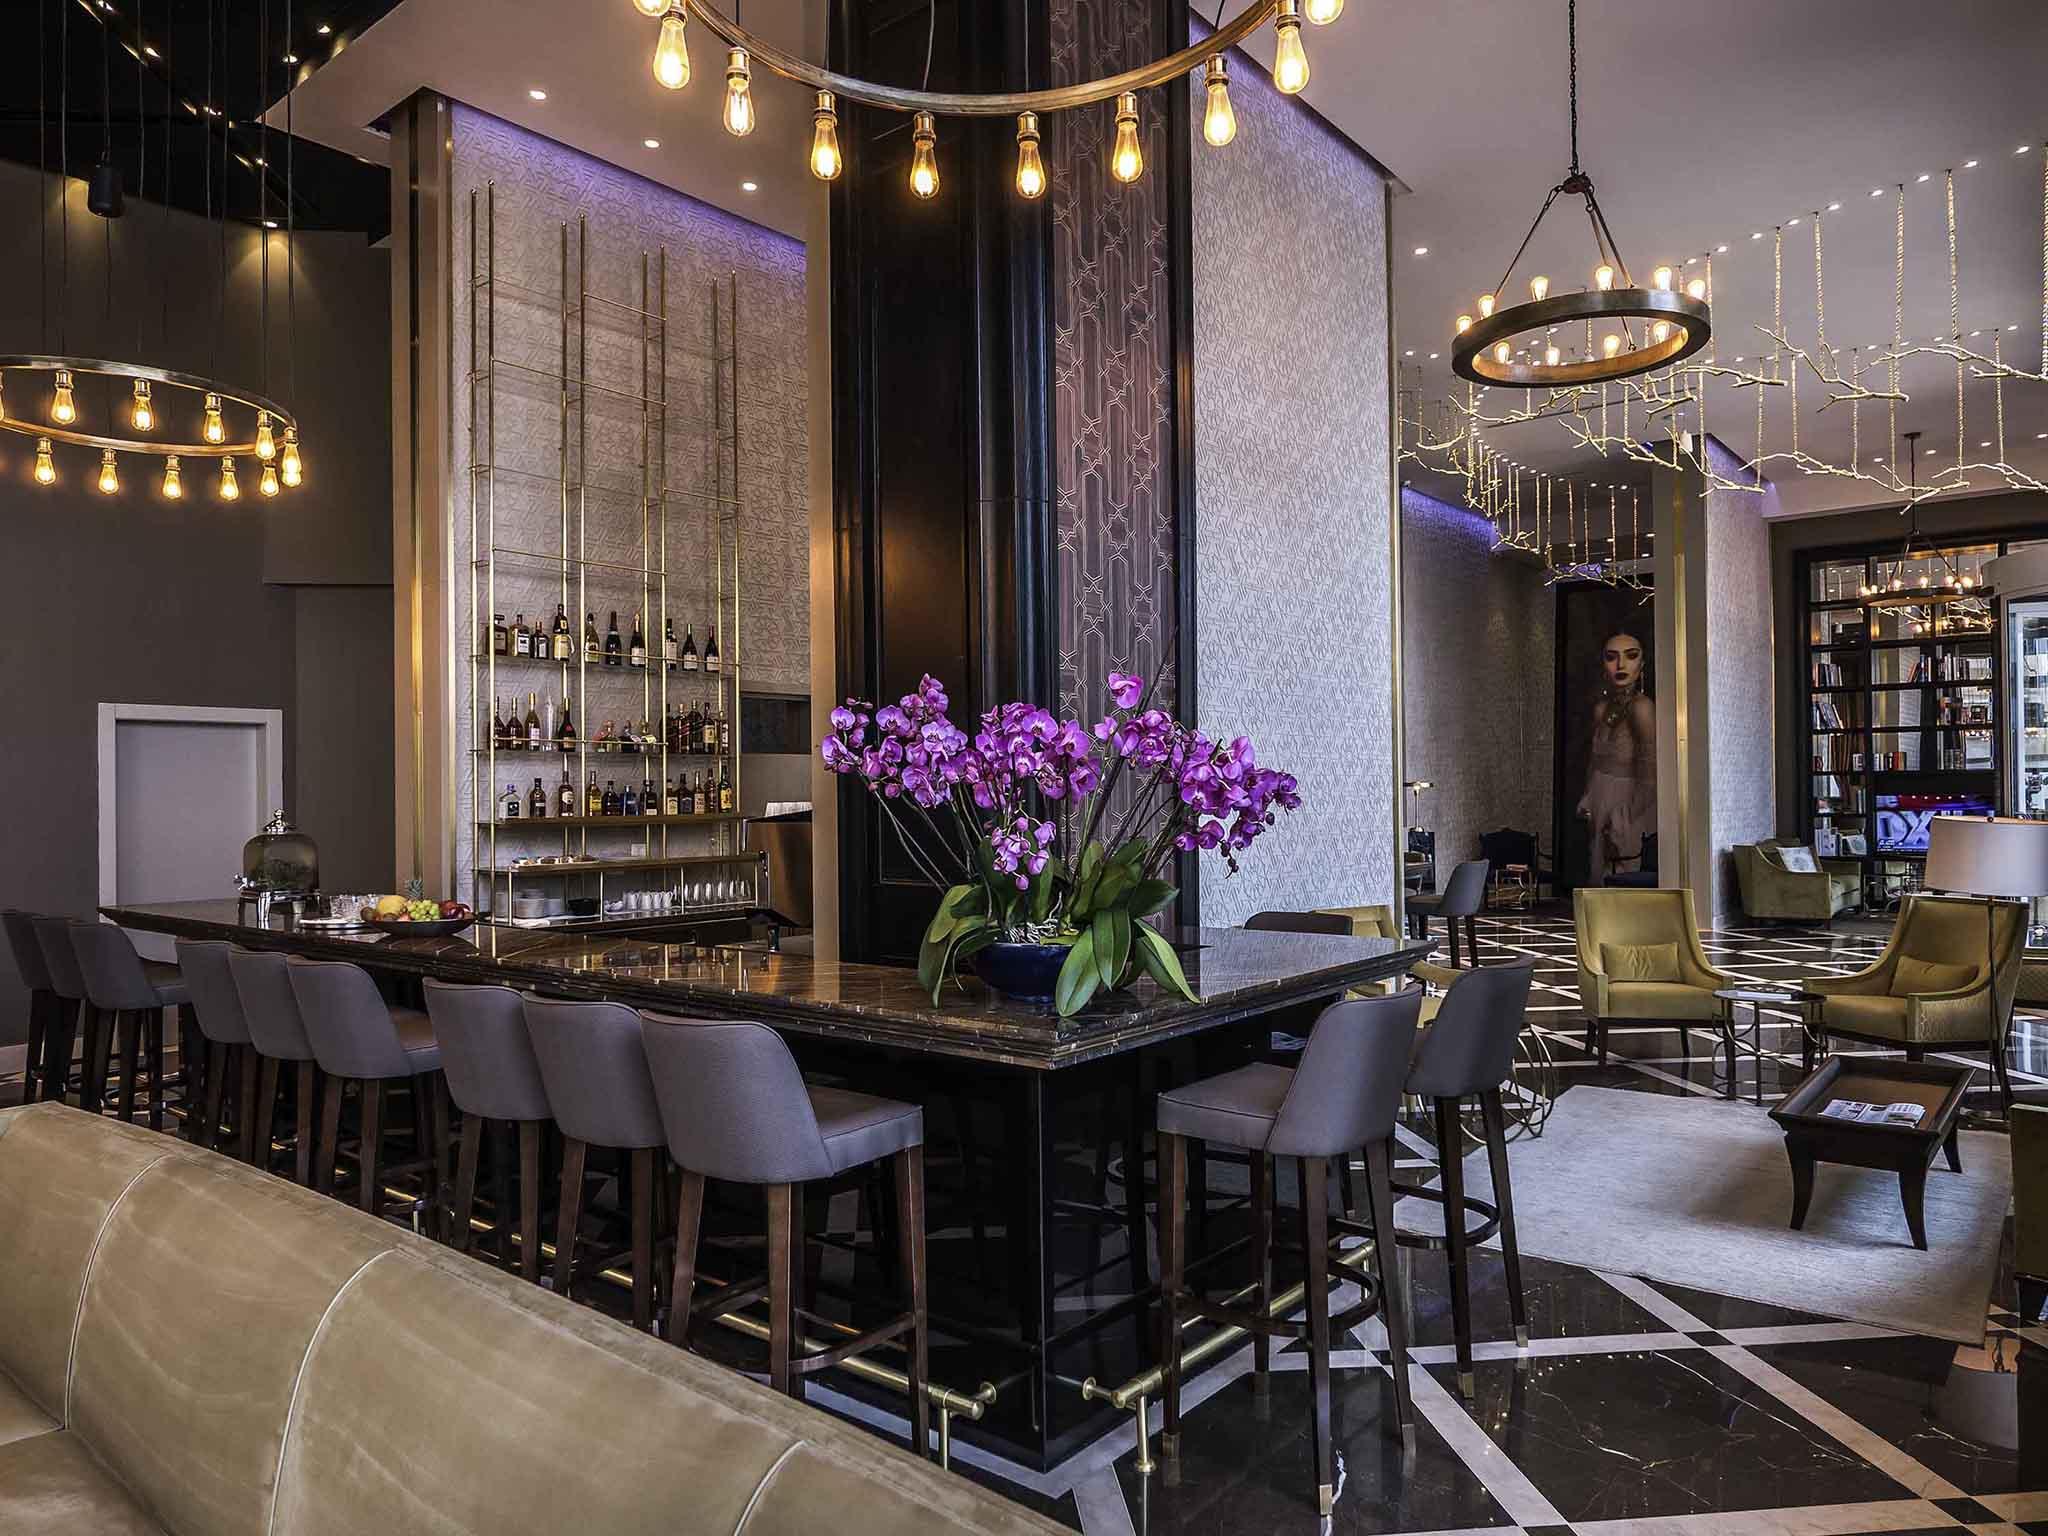 فندق - David Tower Hotel Netanya - MGallery by Sofitel